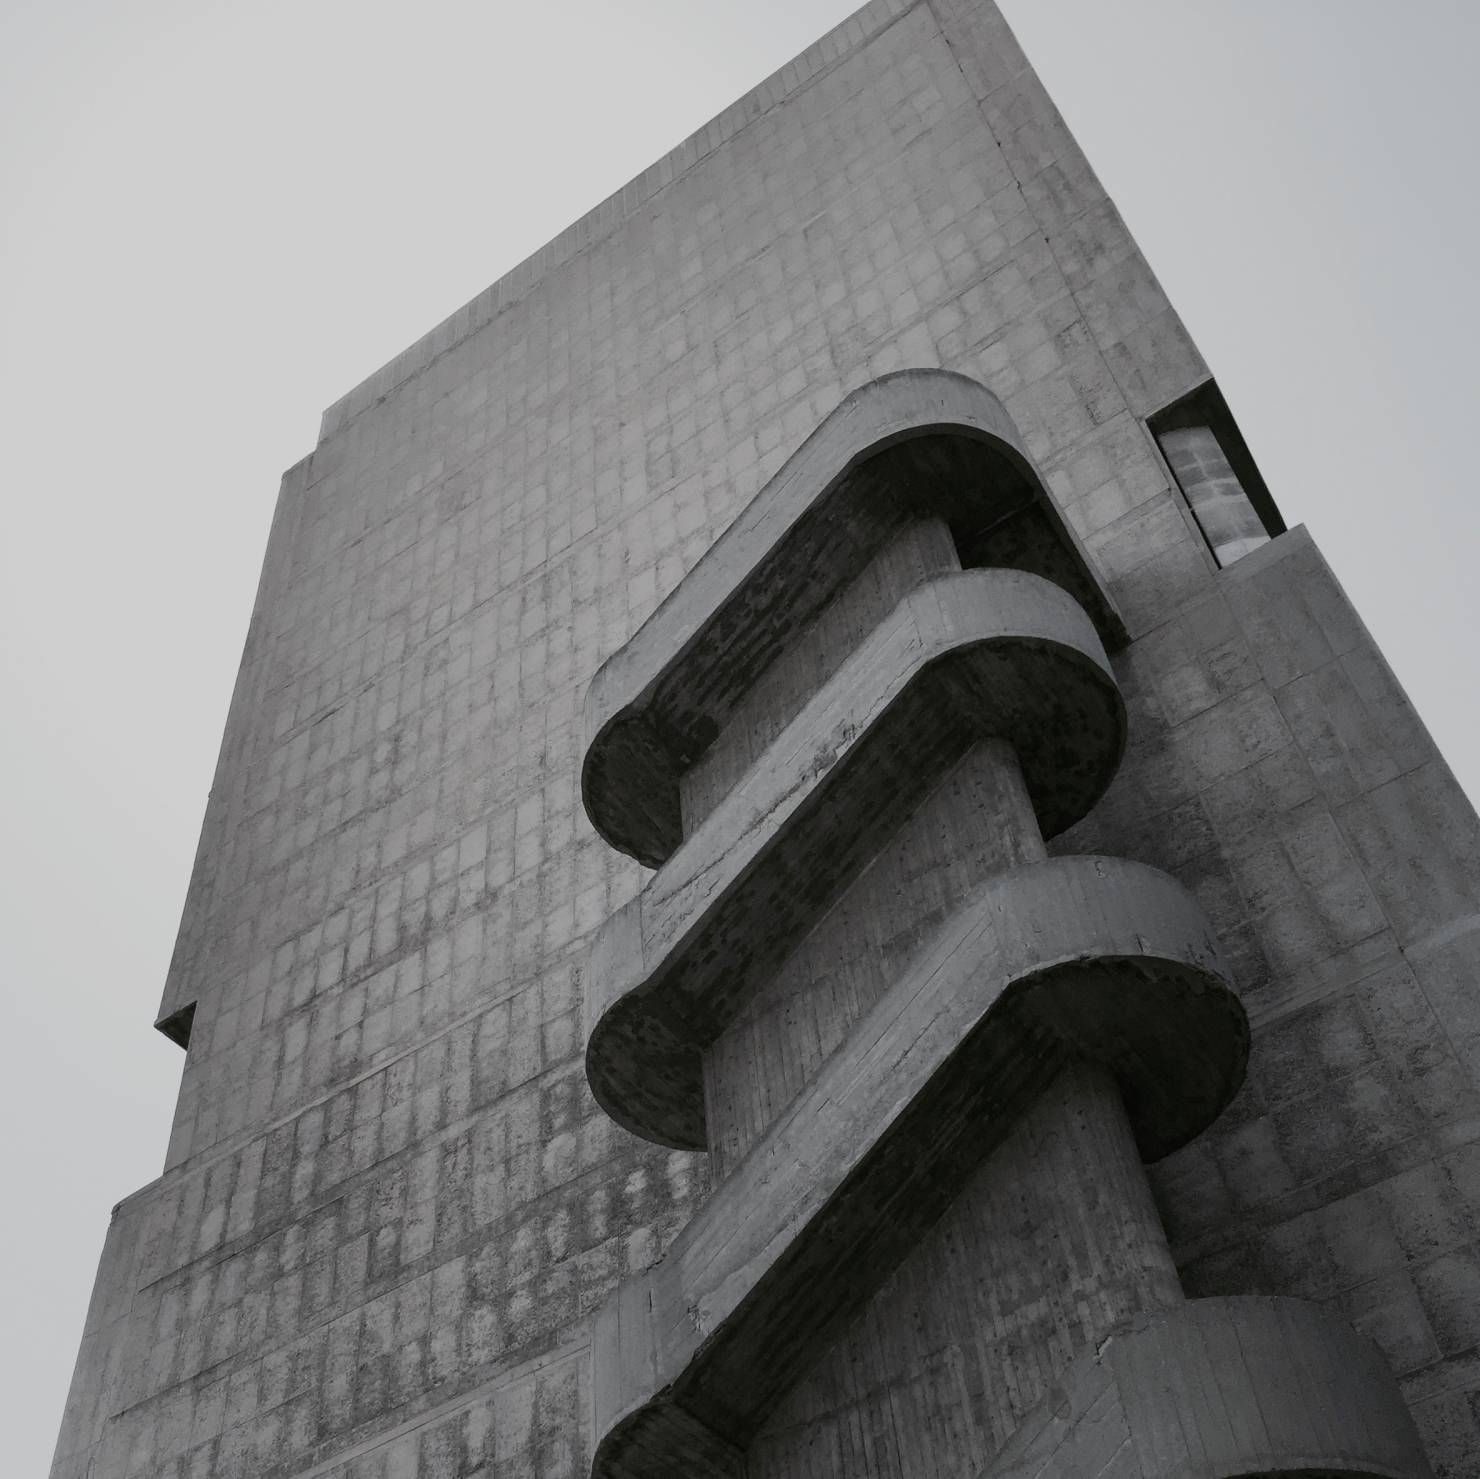 le_corbusier_unite_d-habitation_marseille_patrick_schuttler_001-5dabea2ba3e991629122fdd5c4cf9dbb